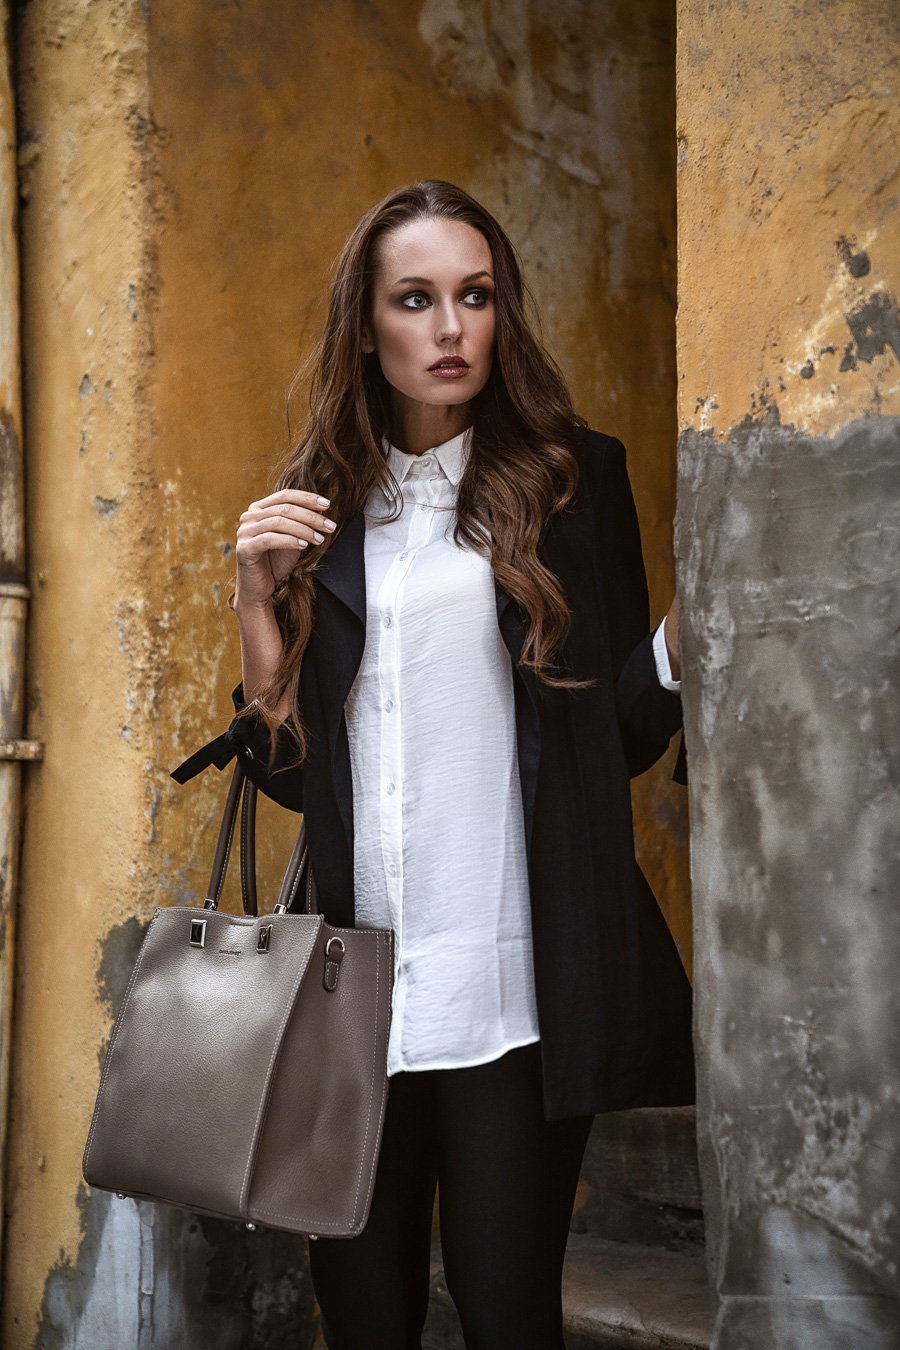 Moda Çekimi - Editorial - Beauty moda tekstil burakbulutfotografatolyesi 30